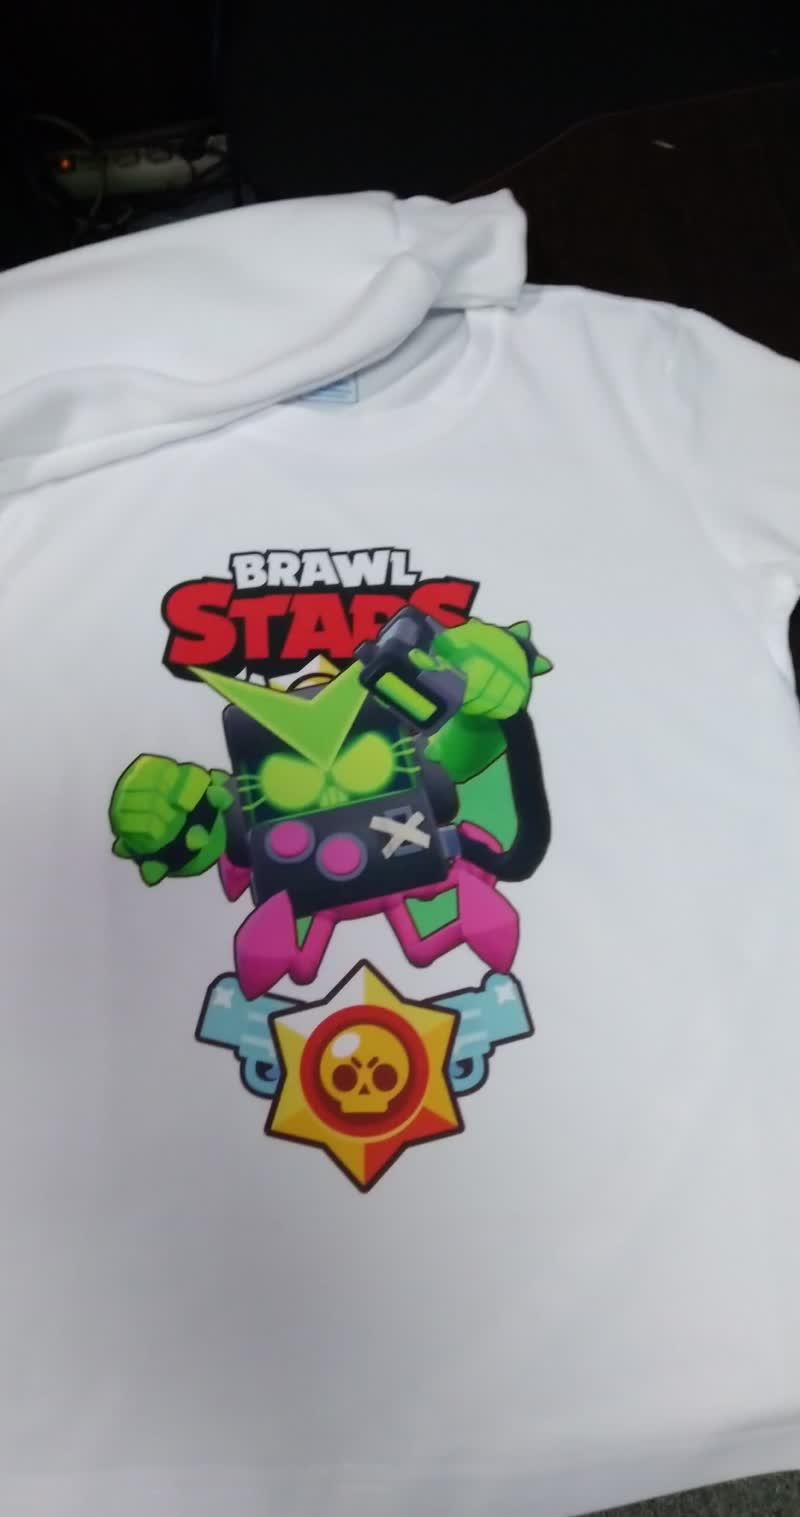 Футболка и толстовка Brawl stars.